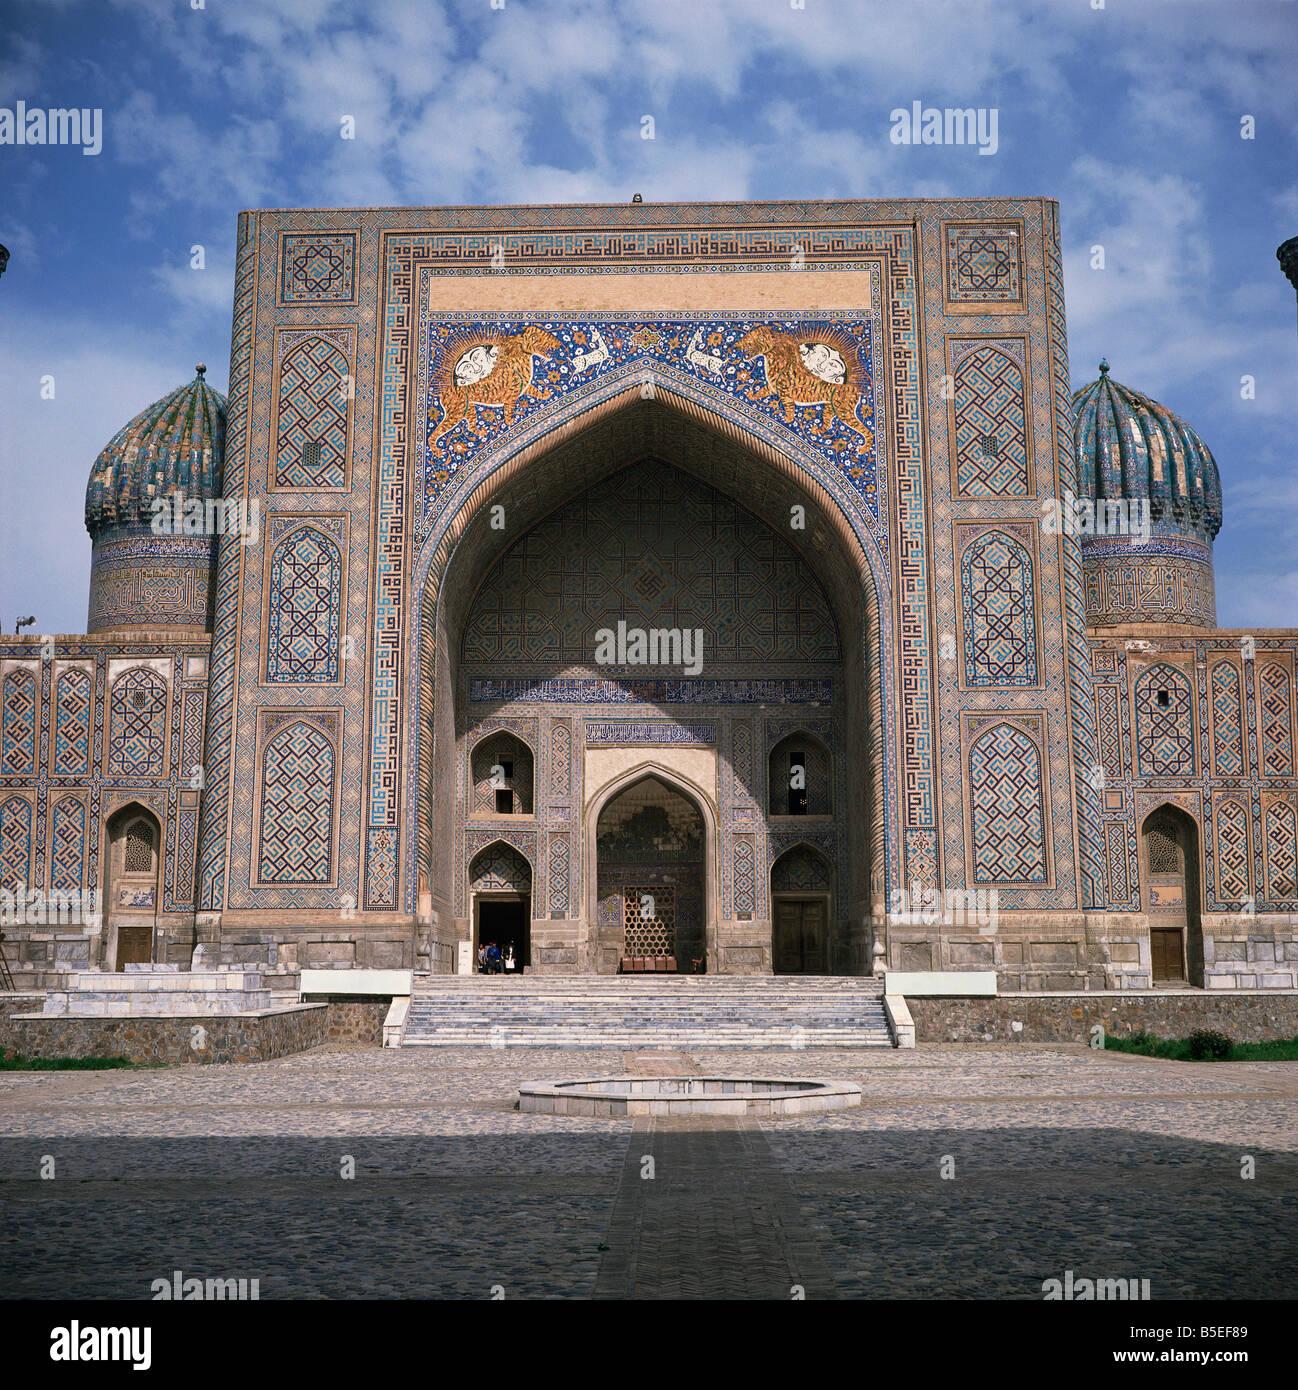 Dating sites Uzbekistan